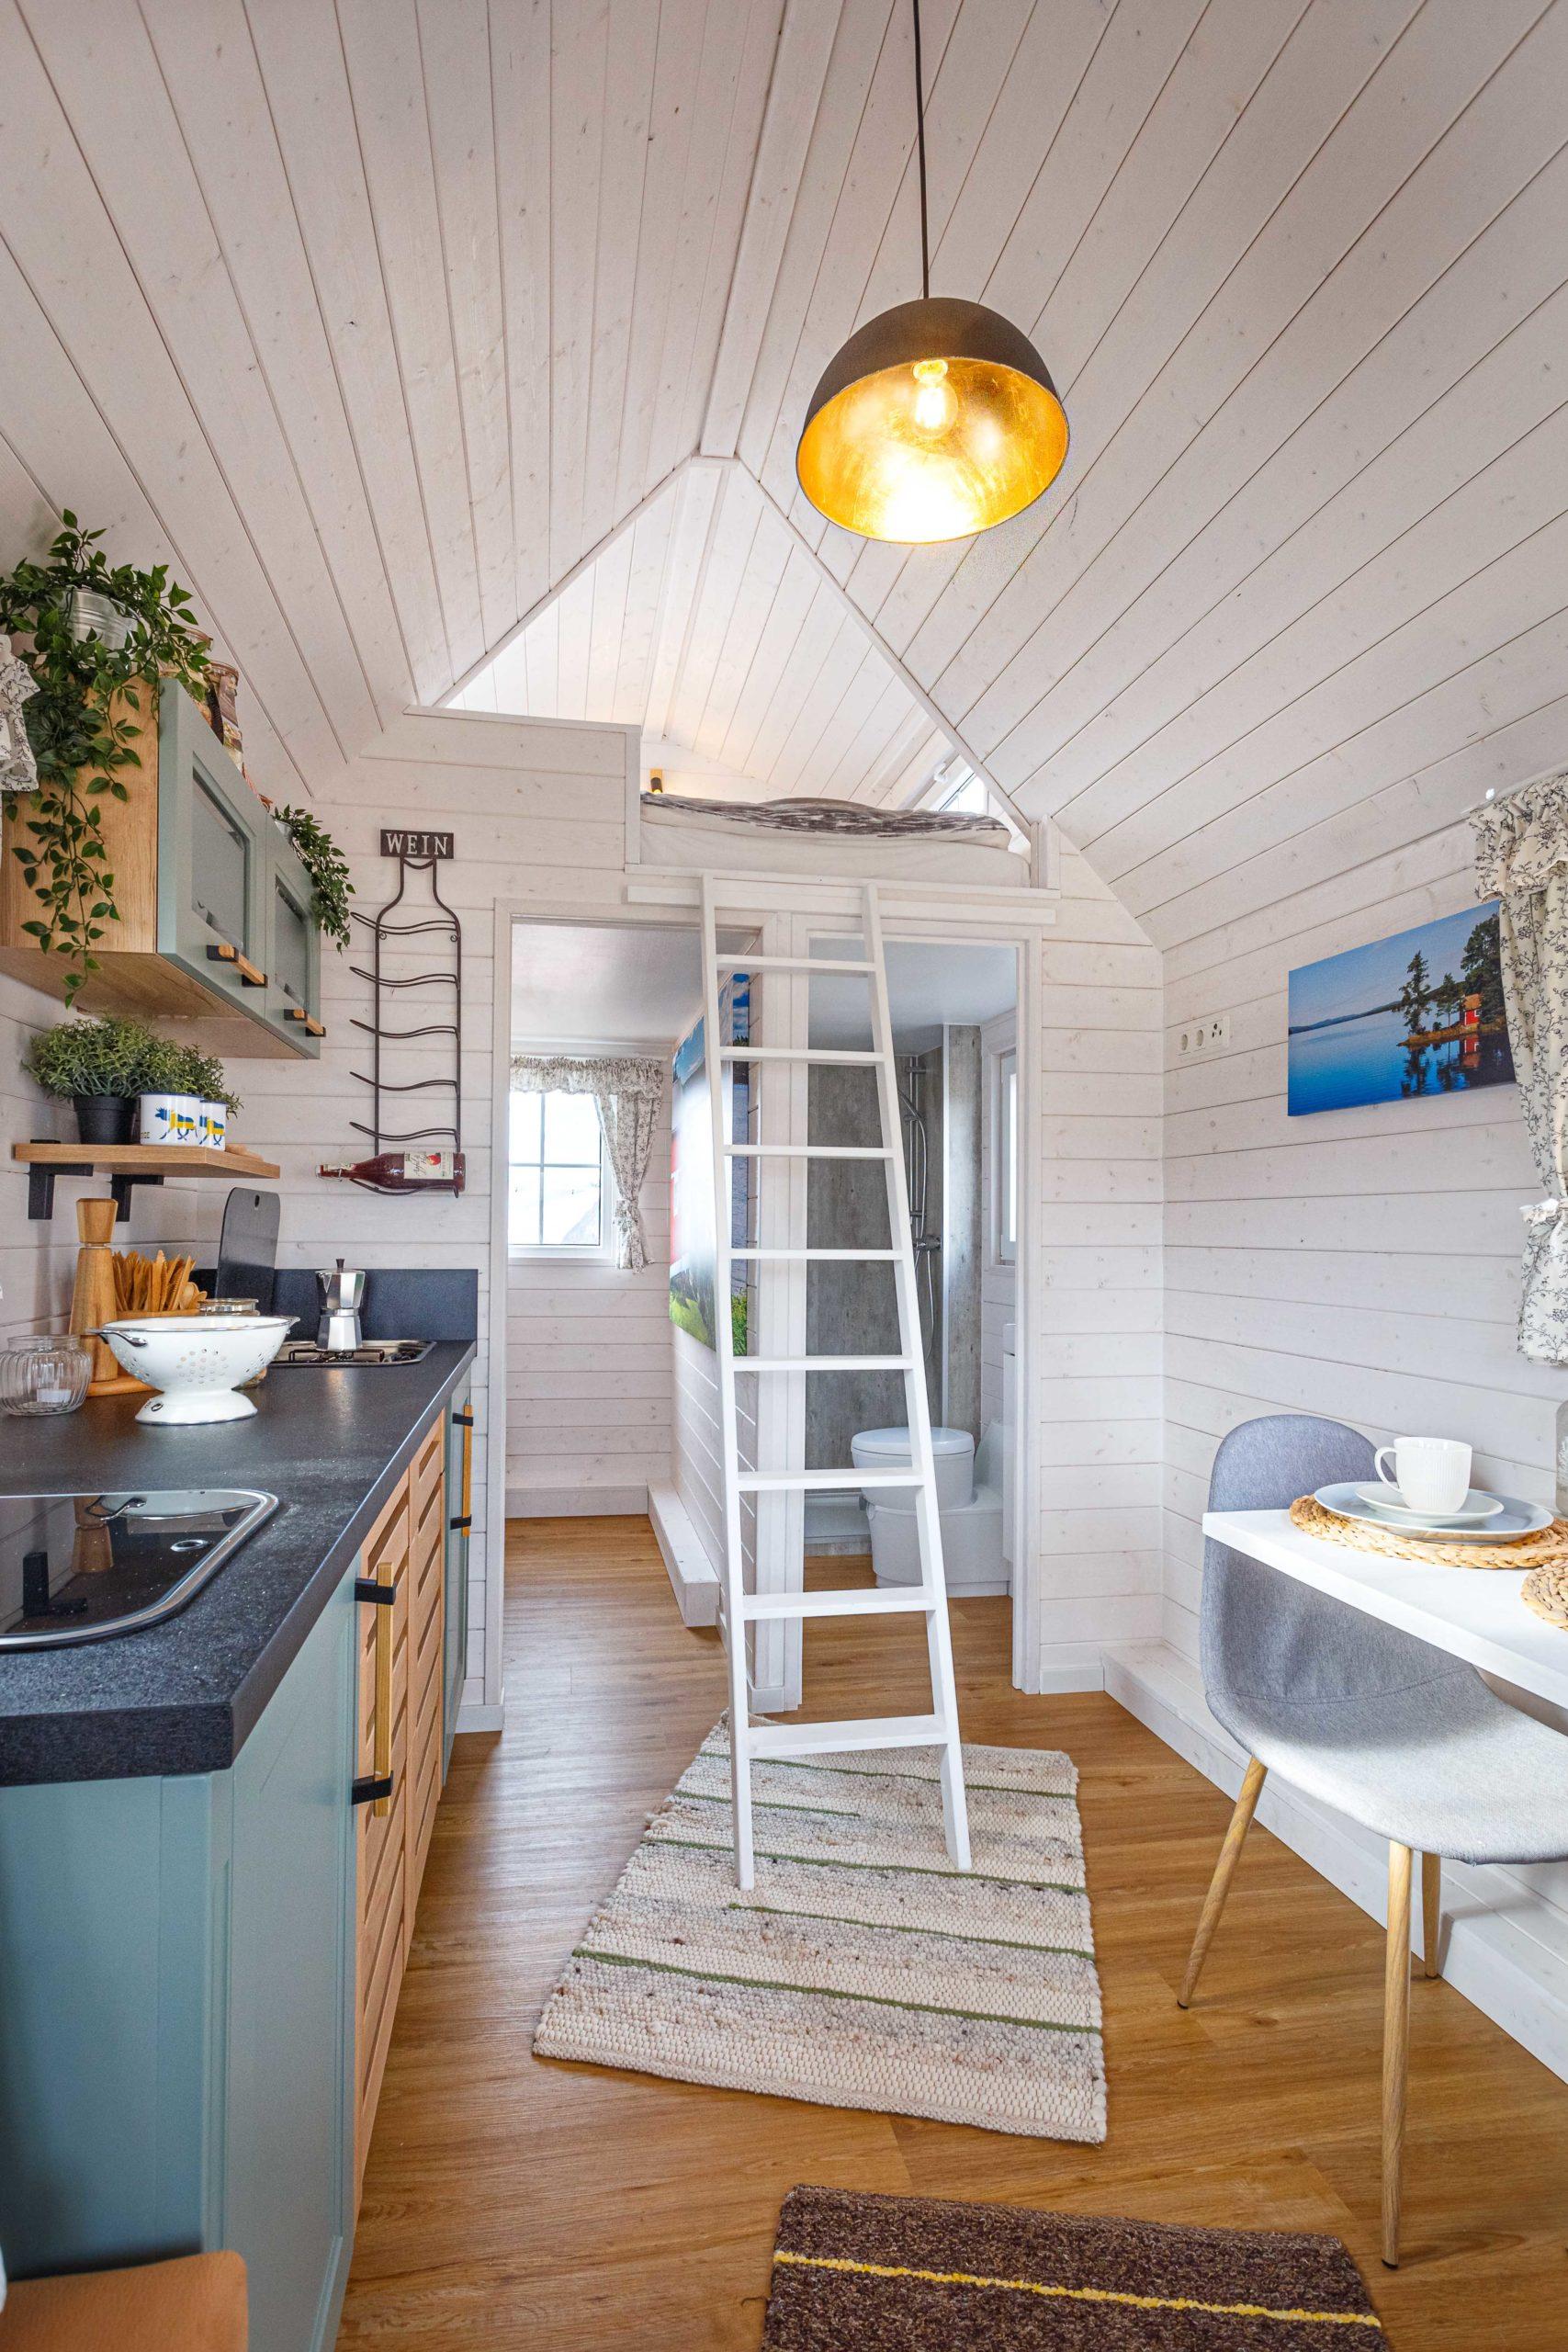 mobiles-tiny-house-schweden-vital-camp-gmbh-09